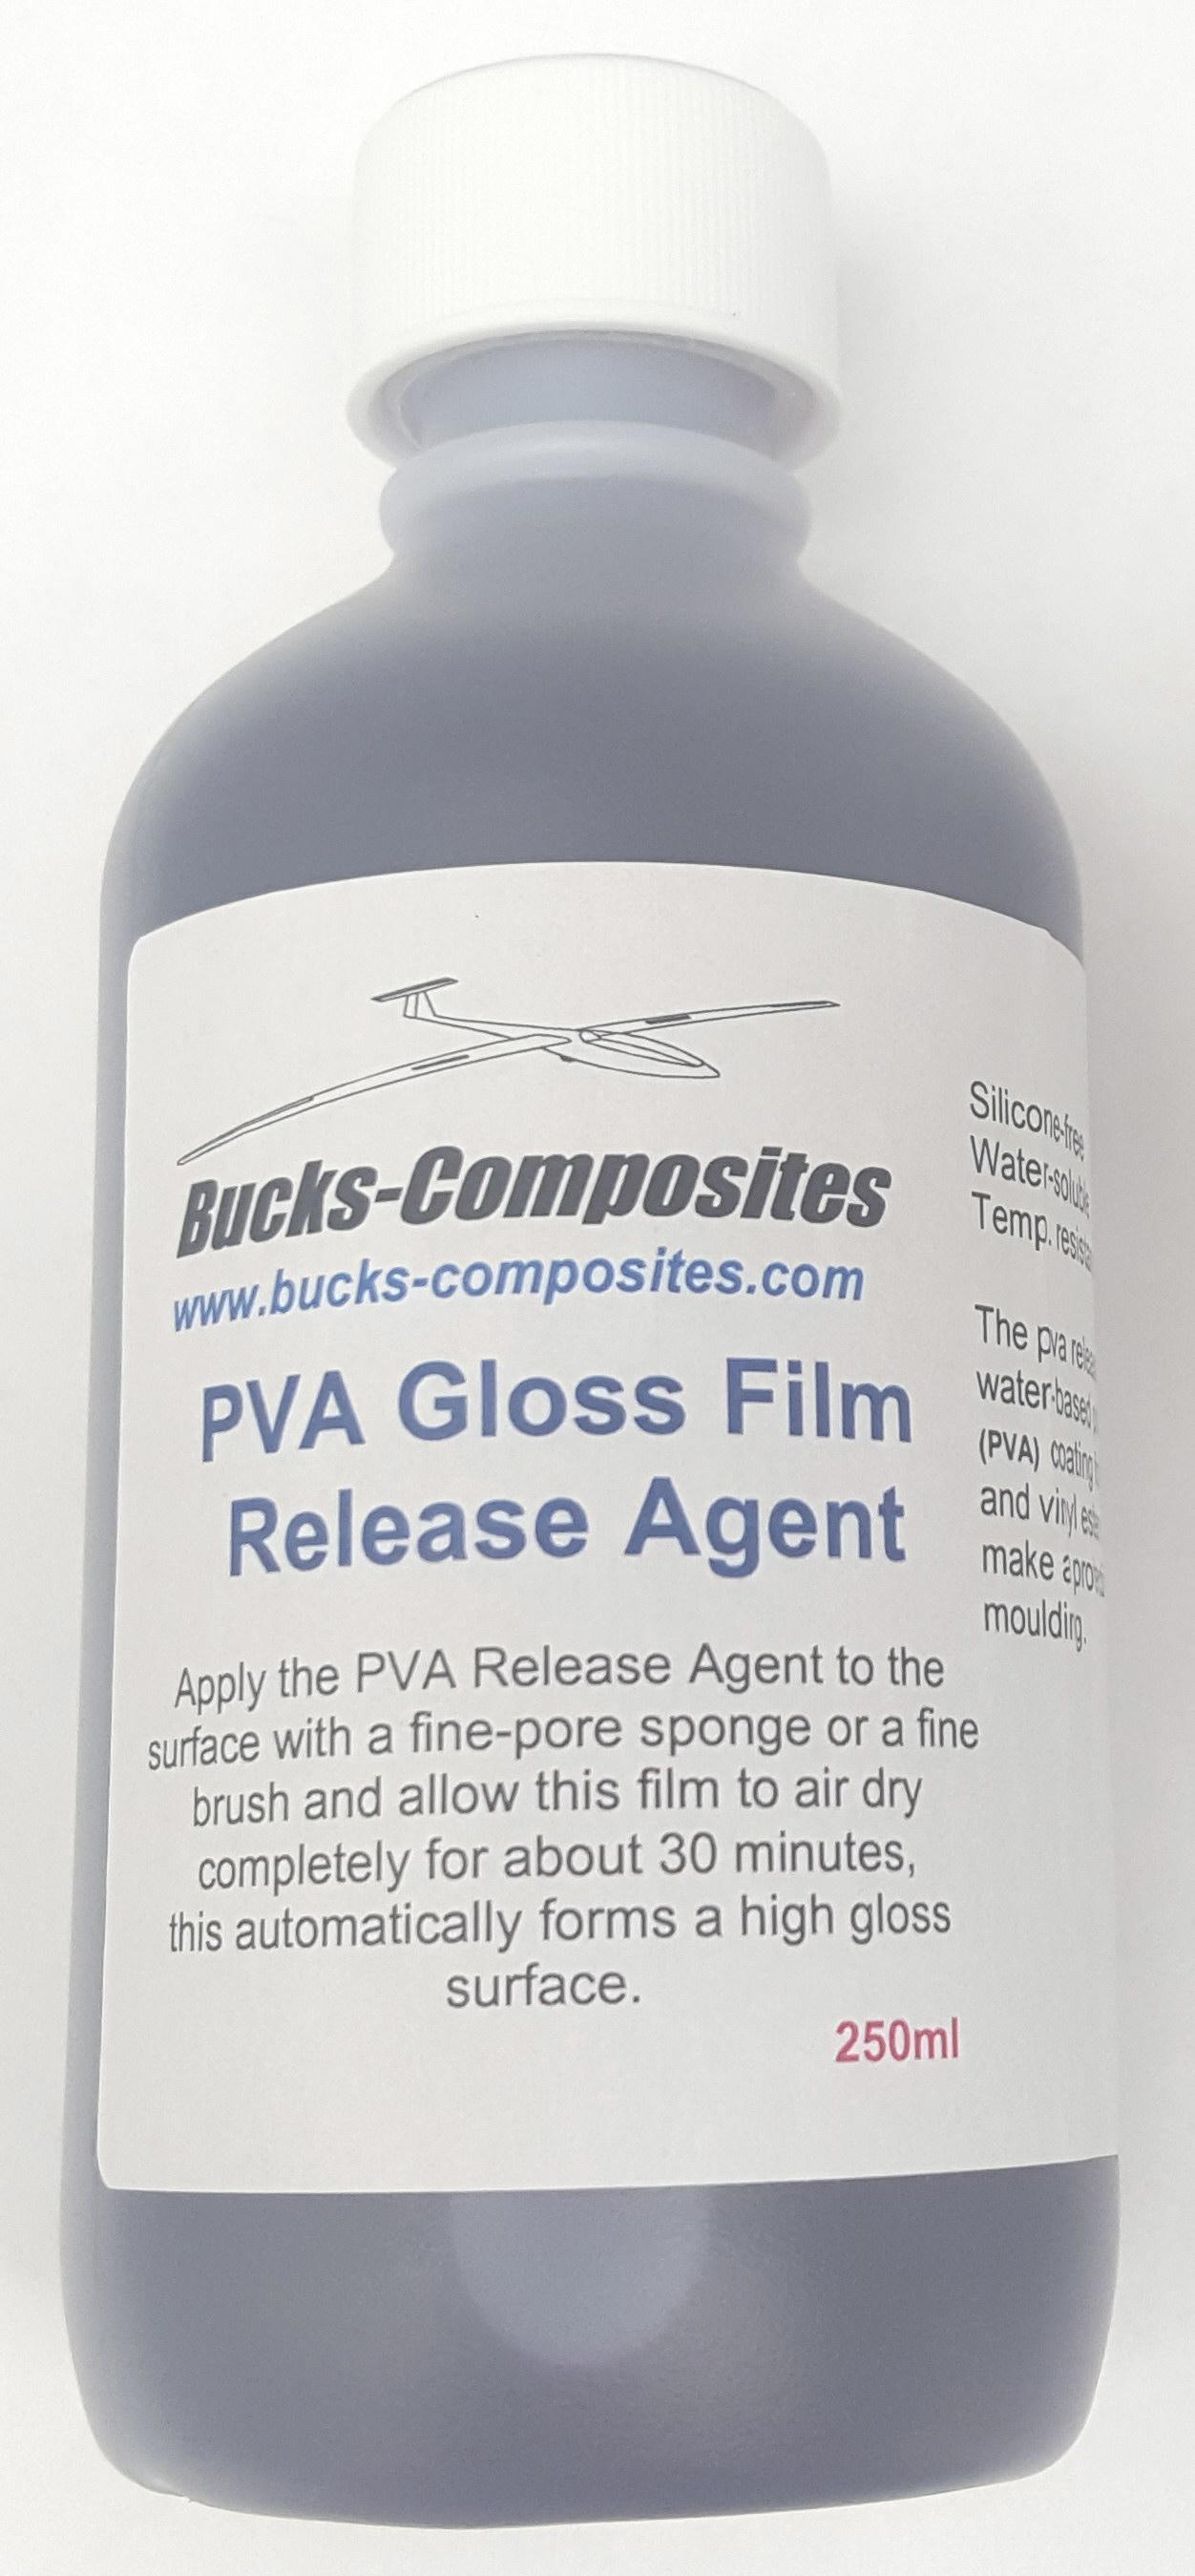 PVA Gloss Film Release Agent | Bucks Composites